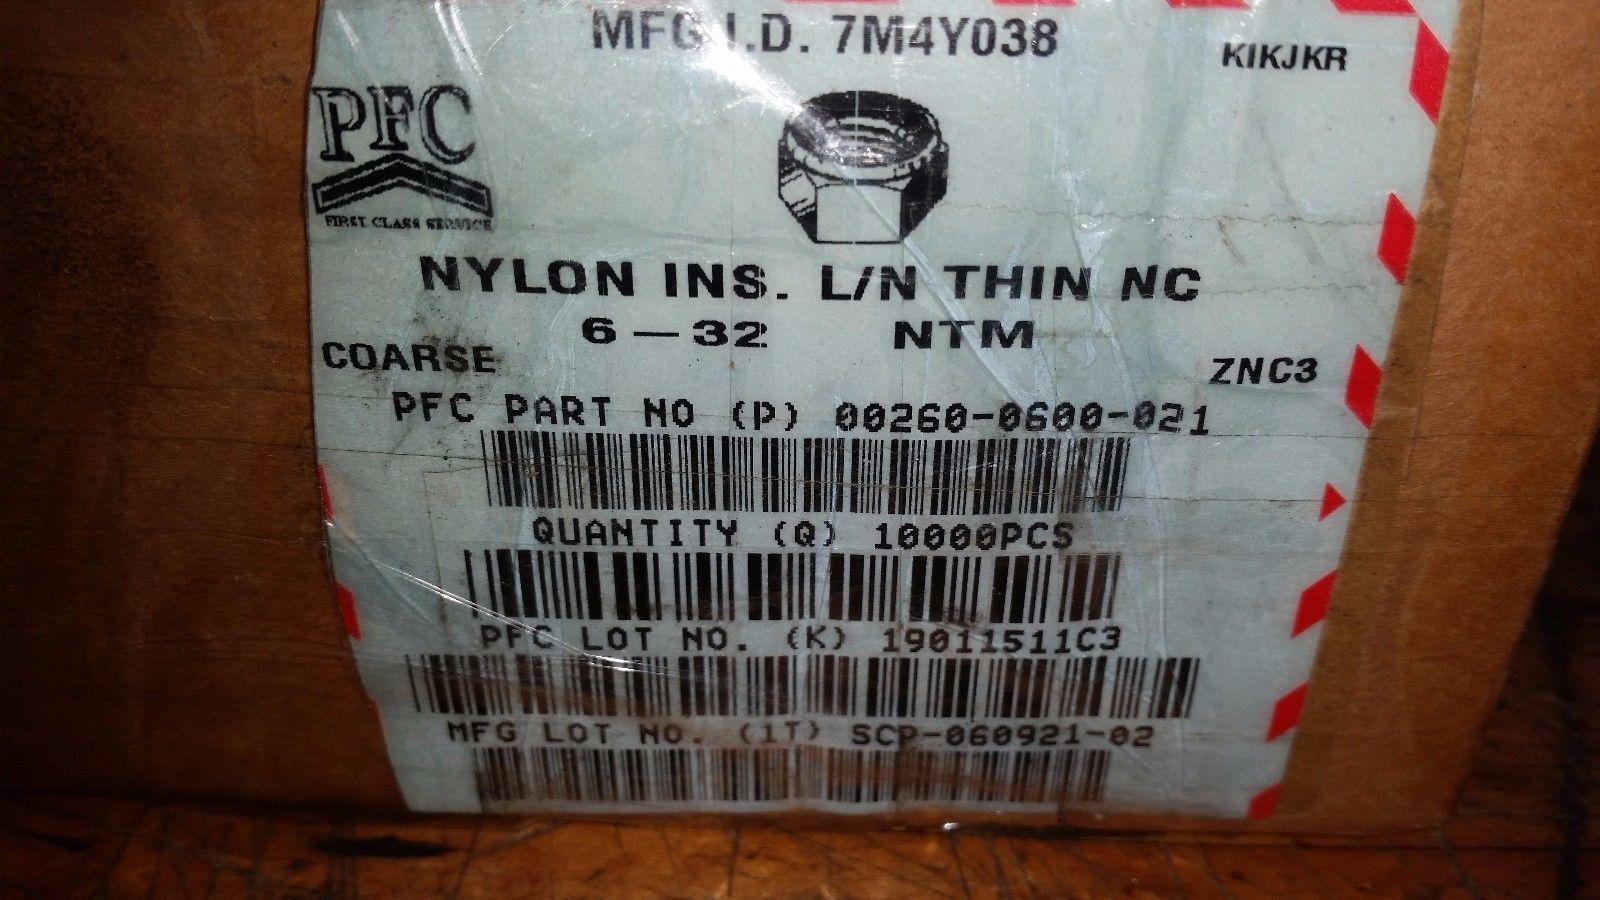 10,000 pcs  Nyloc #6 Hex Machine Nuts 6-32 NC Zinc Plated Nylock nylon insert